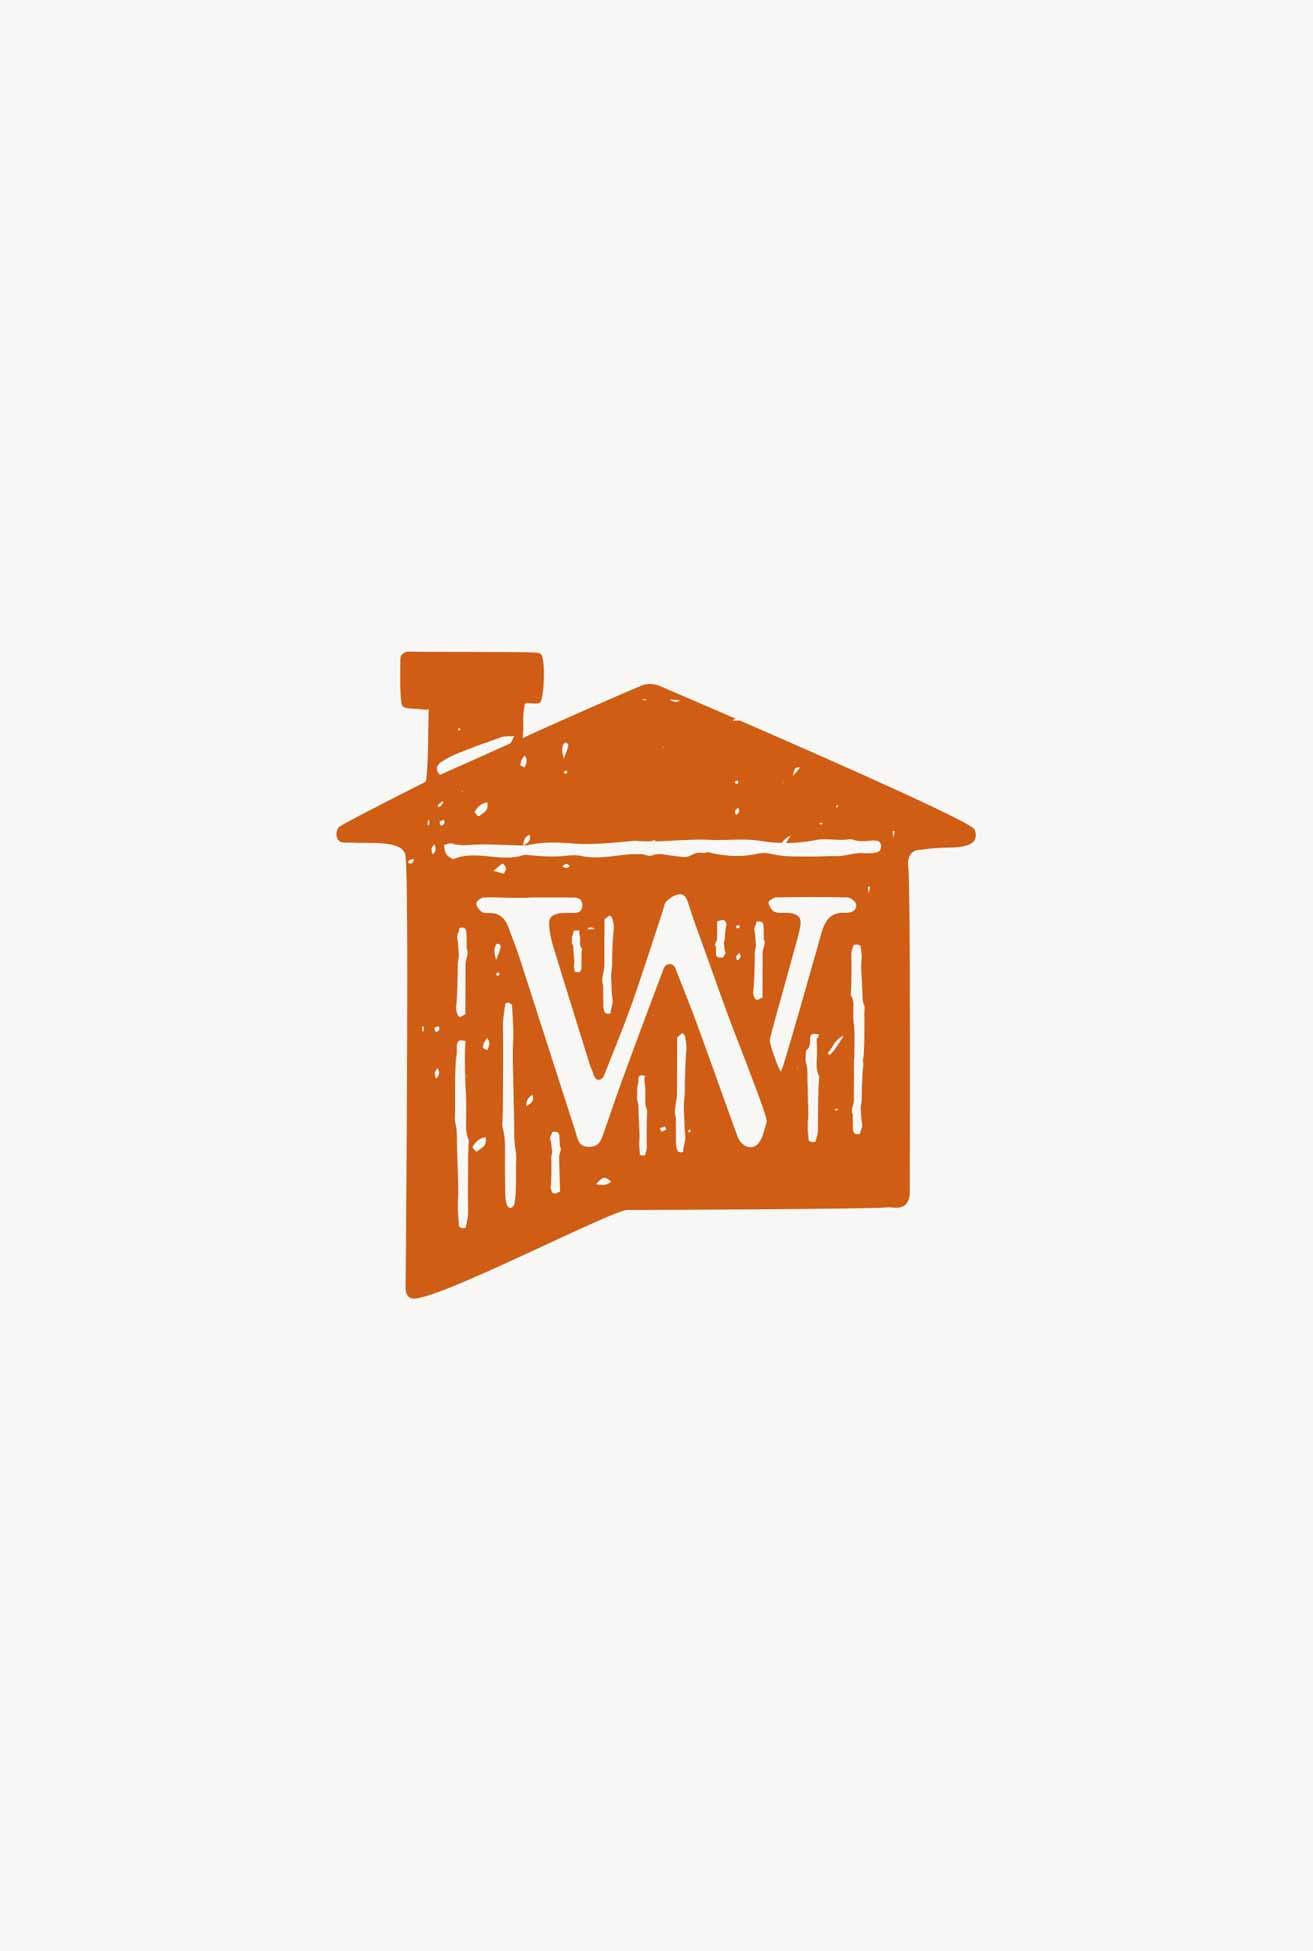 theworklodge-vert_W-house-mark.jpg